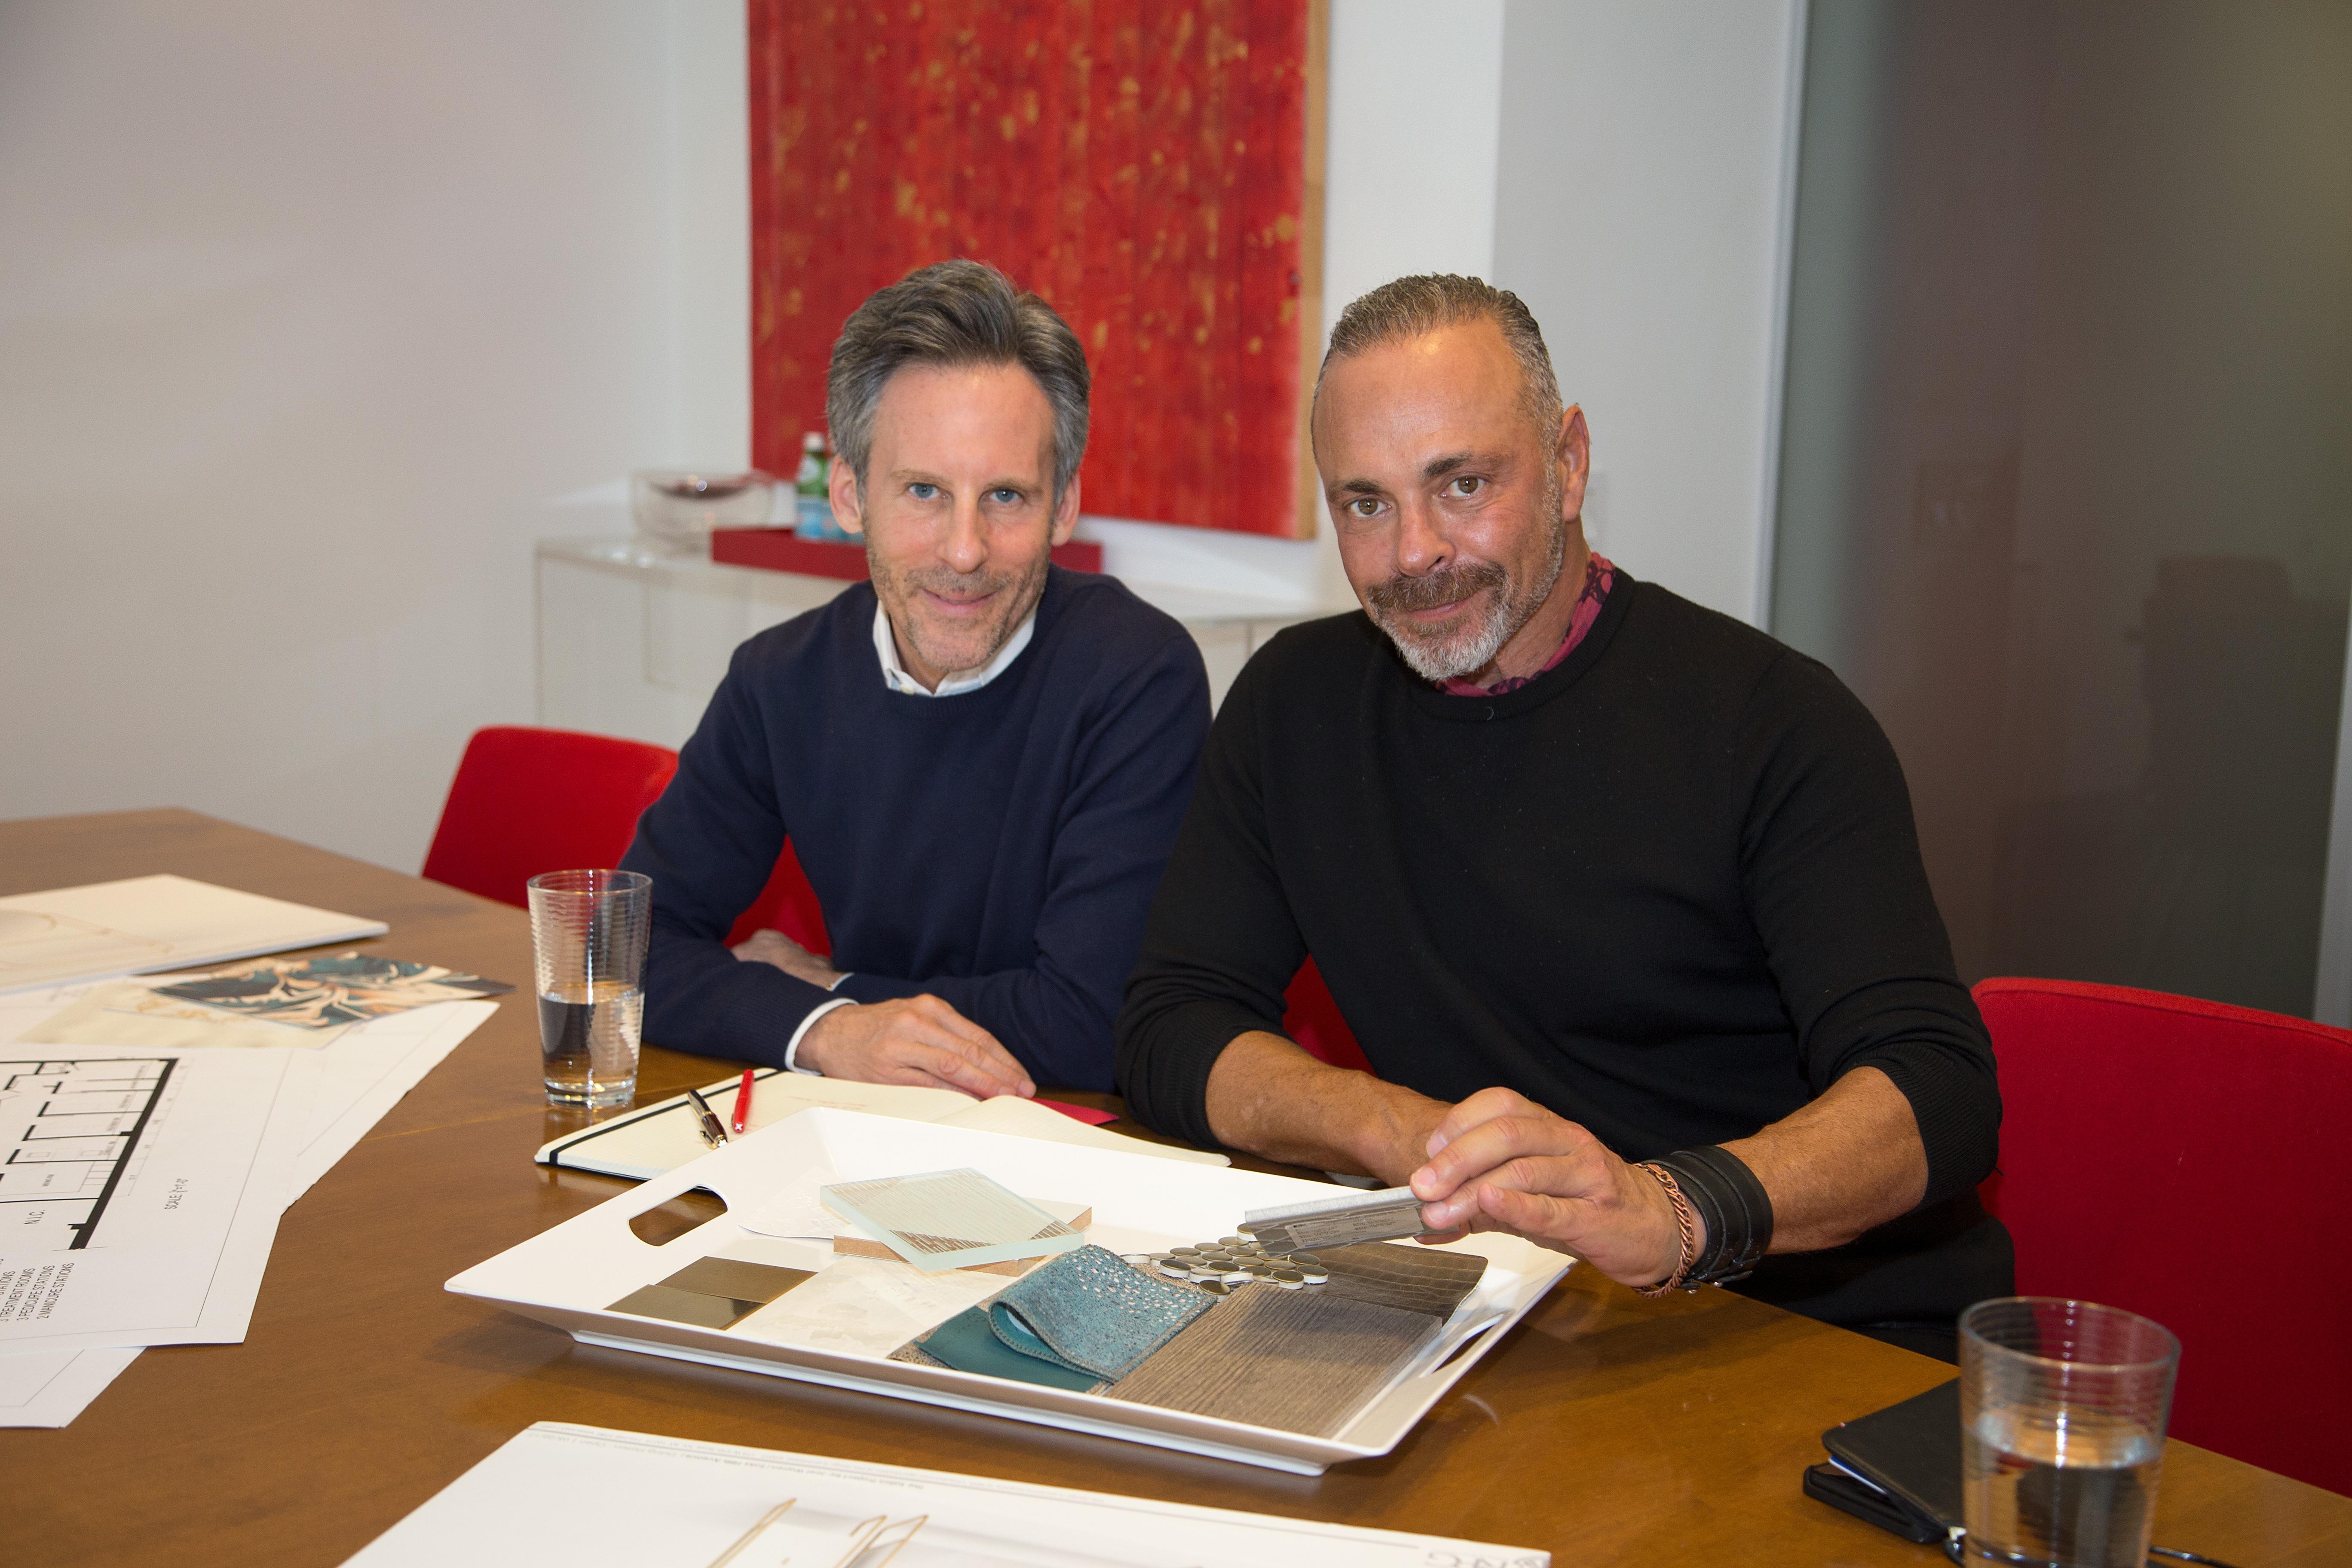 Joel Warren Partners with Saks Fifth Avenue to Create The Salon Project